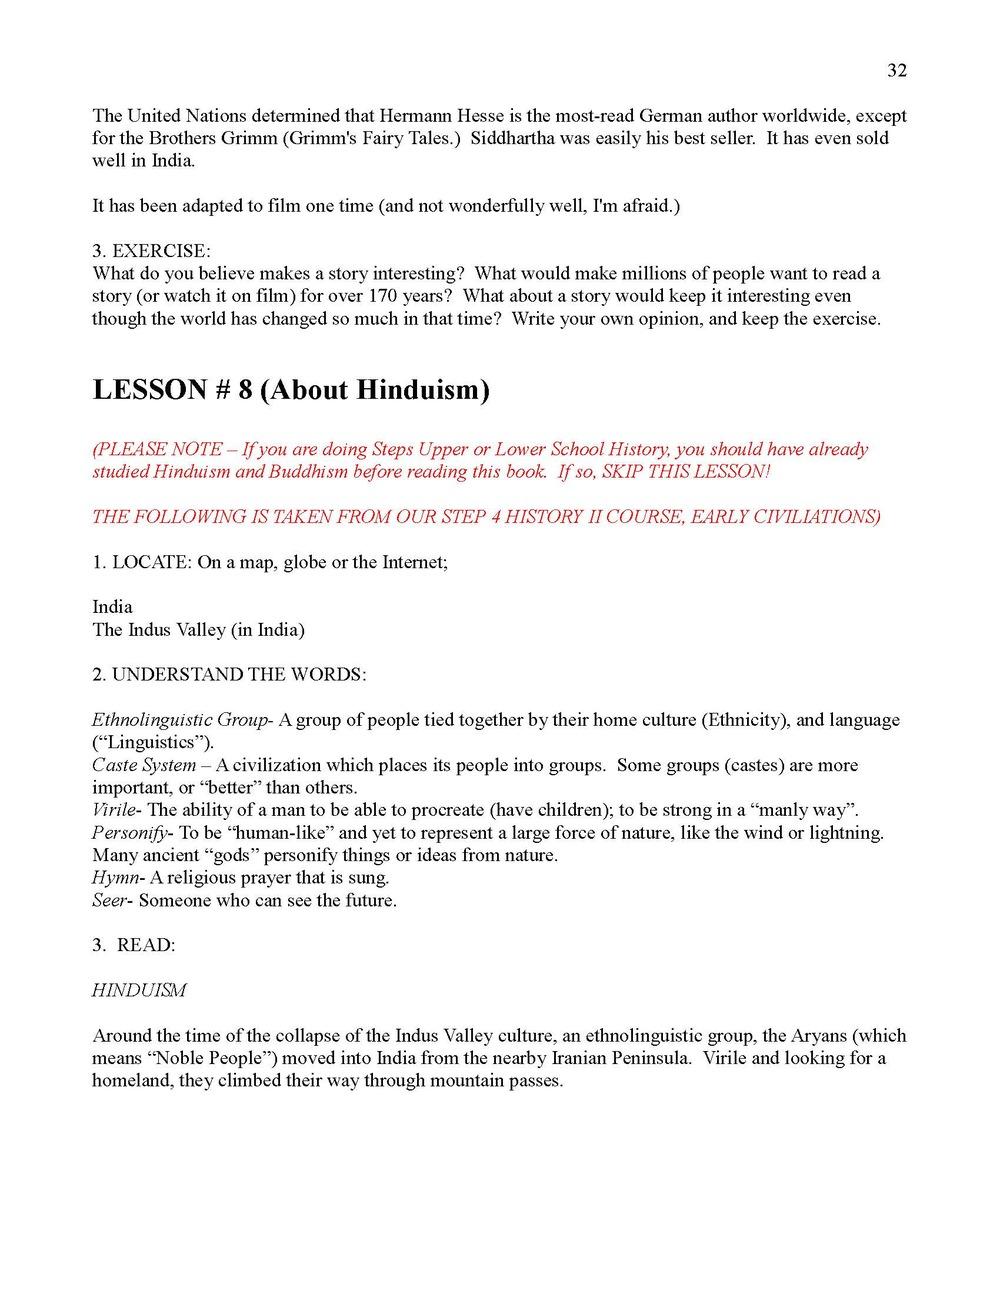 Step 4 Literature Guide - Siddhartha_Page_033.jpg